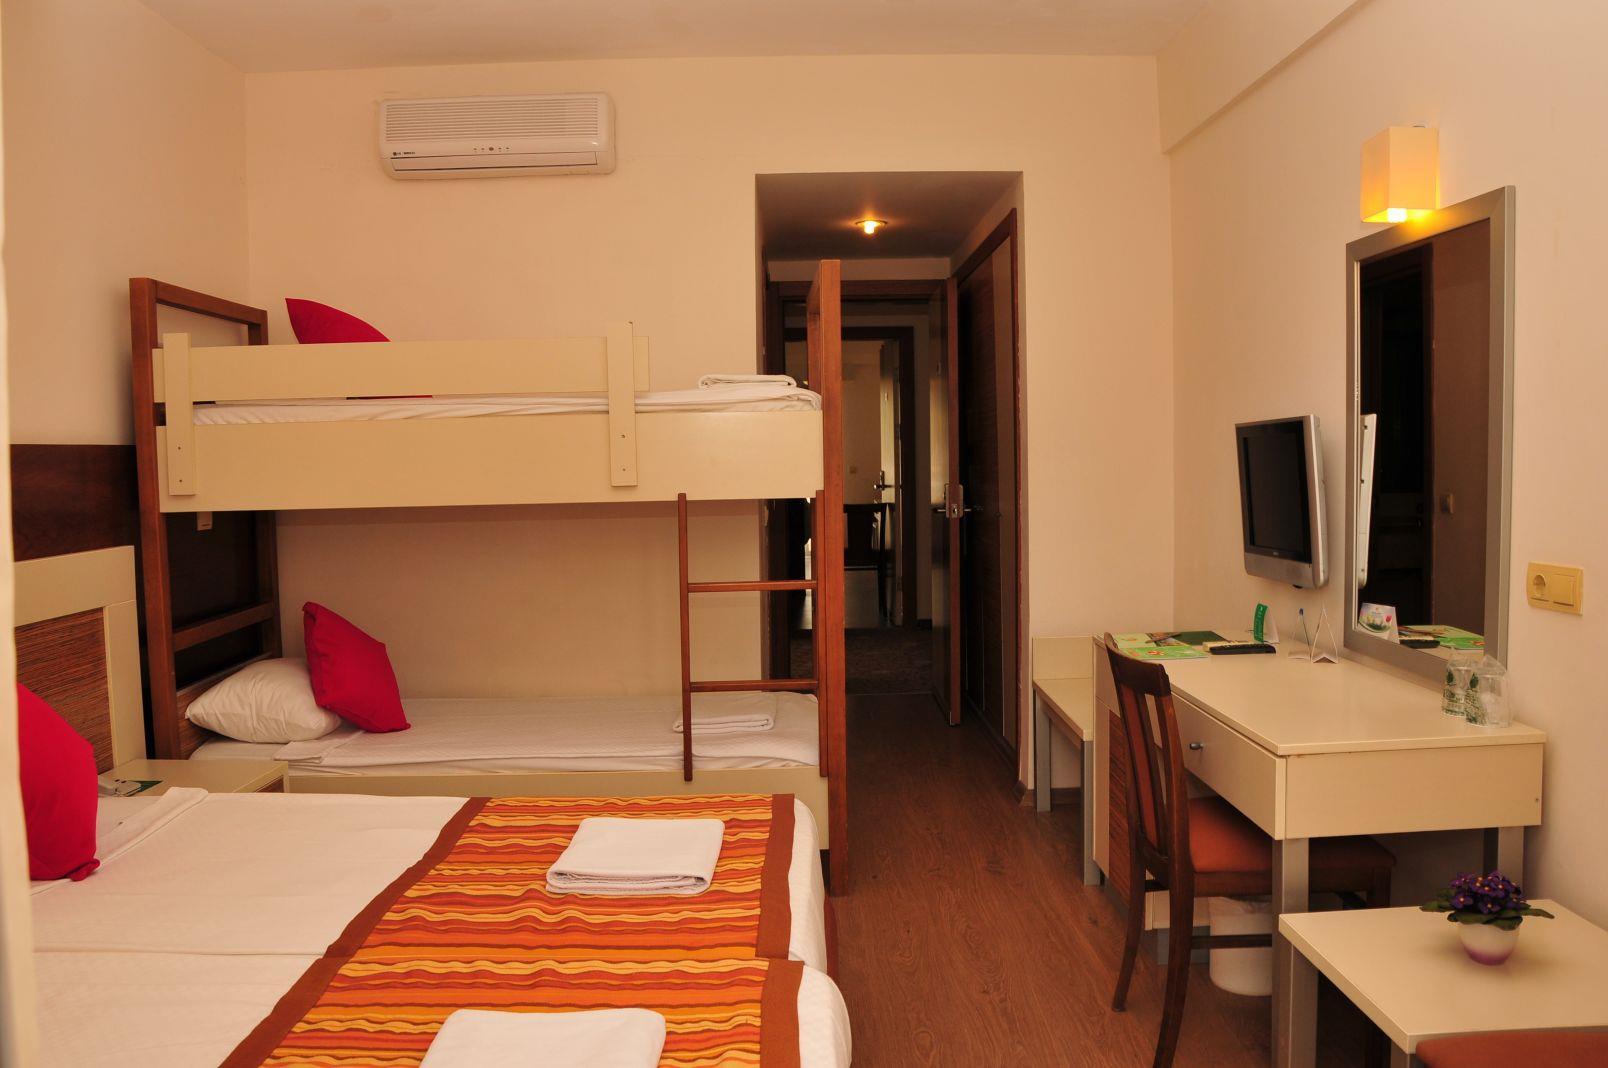 http://www.orextravel.sk/OREX/hotelphotos/seher-sun-beach-general-0012.jpg